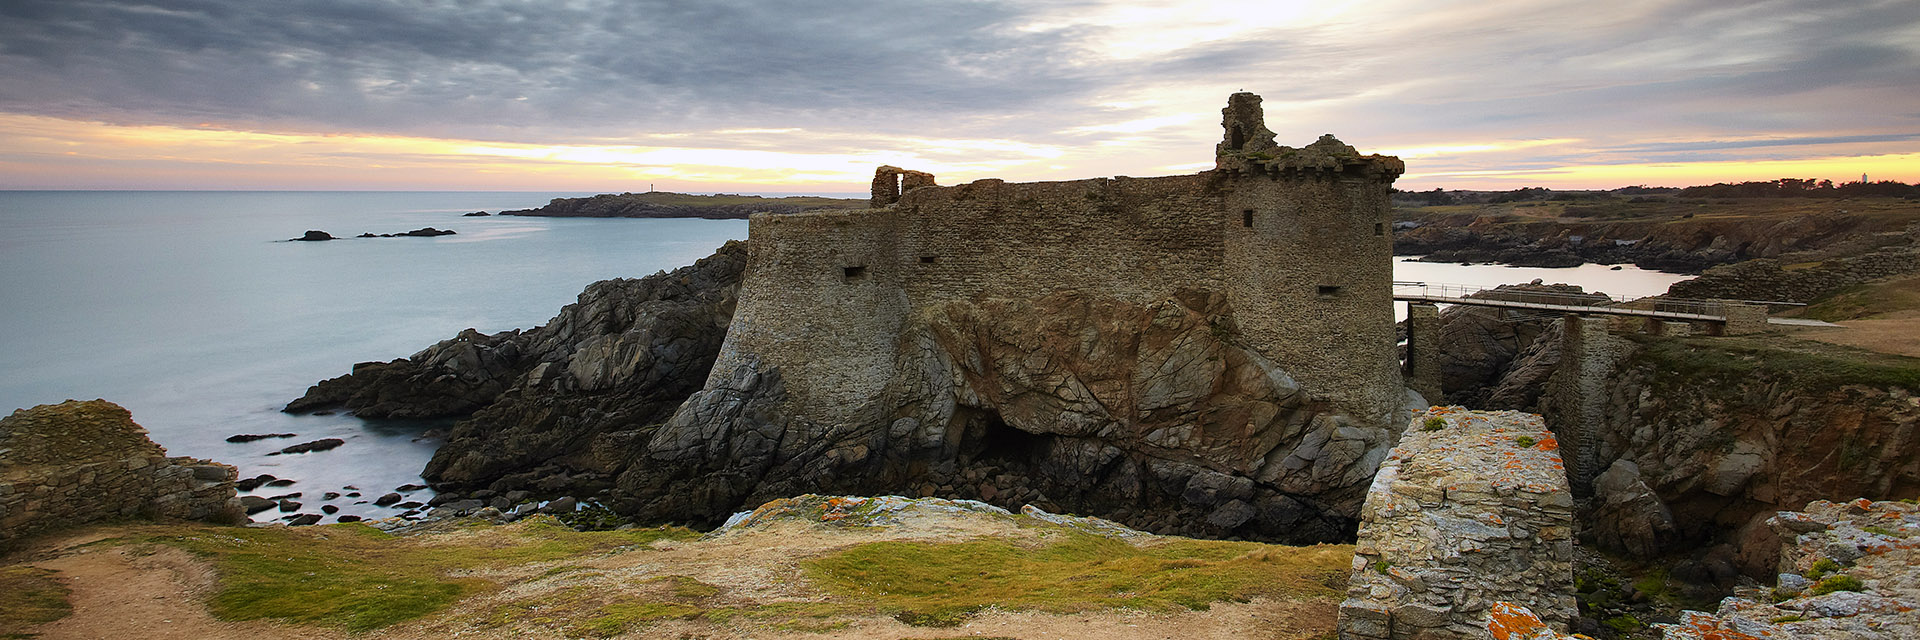 Les îles de Vendée - Les Quatre Vents